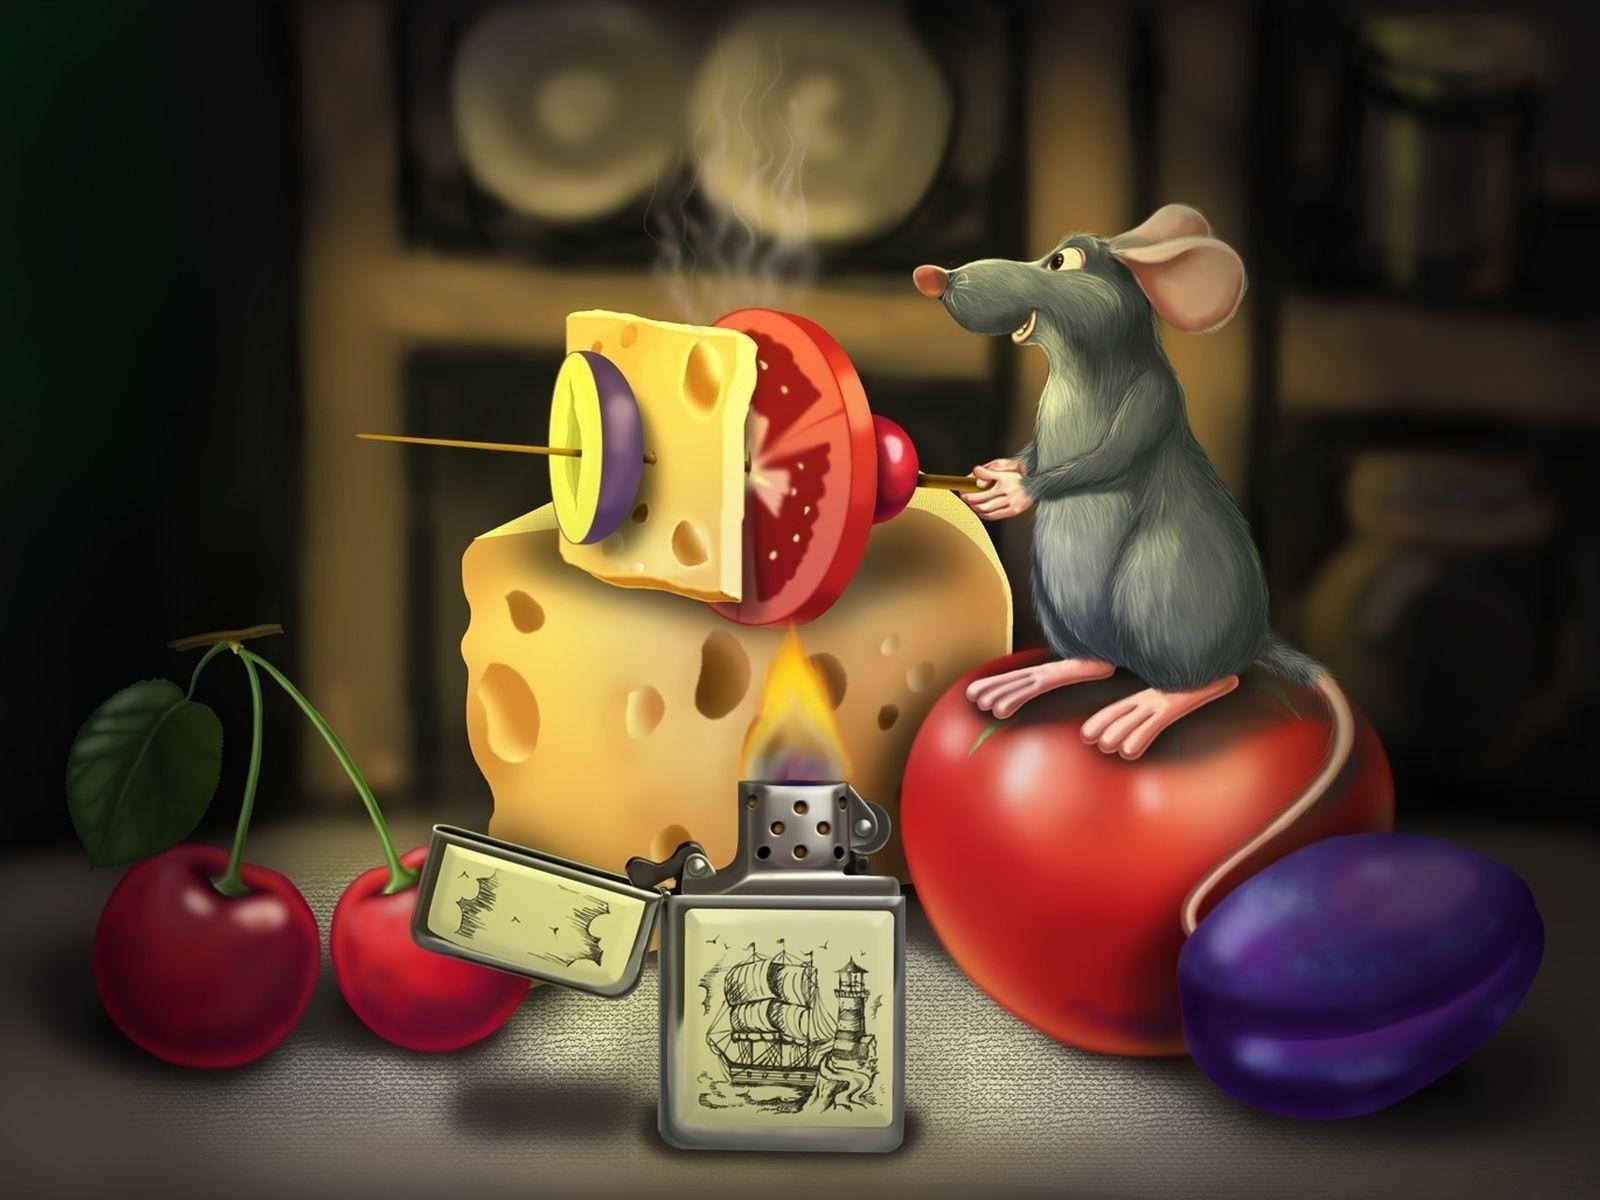 Ratatouille Chef Skinner - wallpaper.